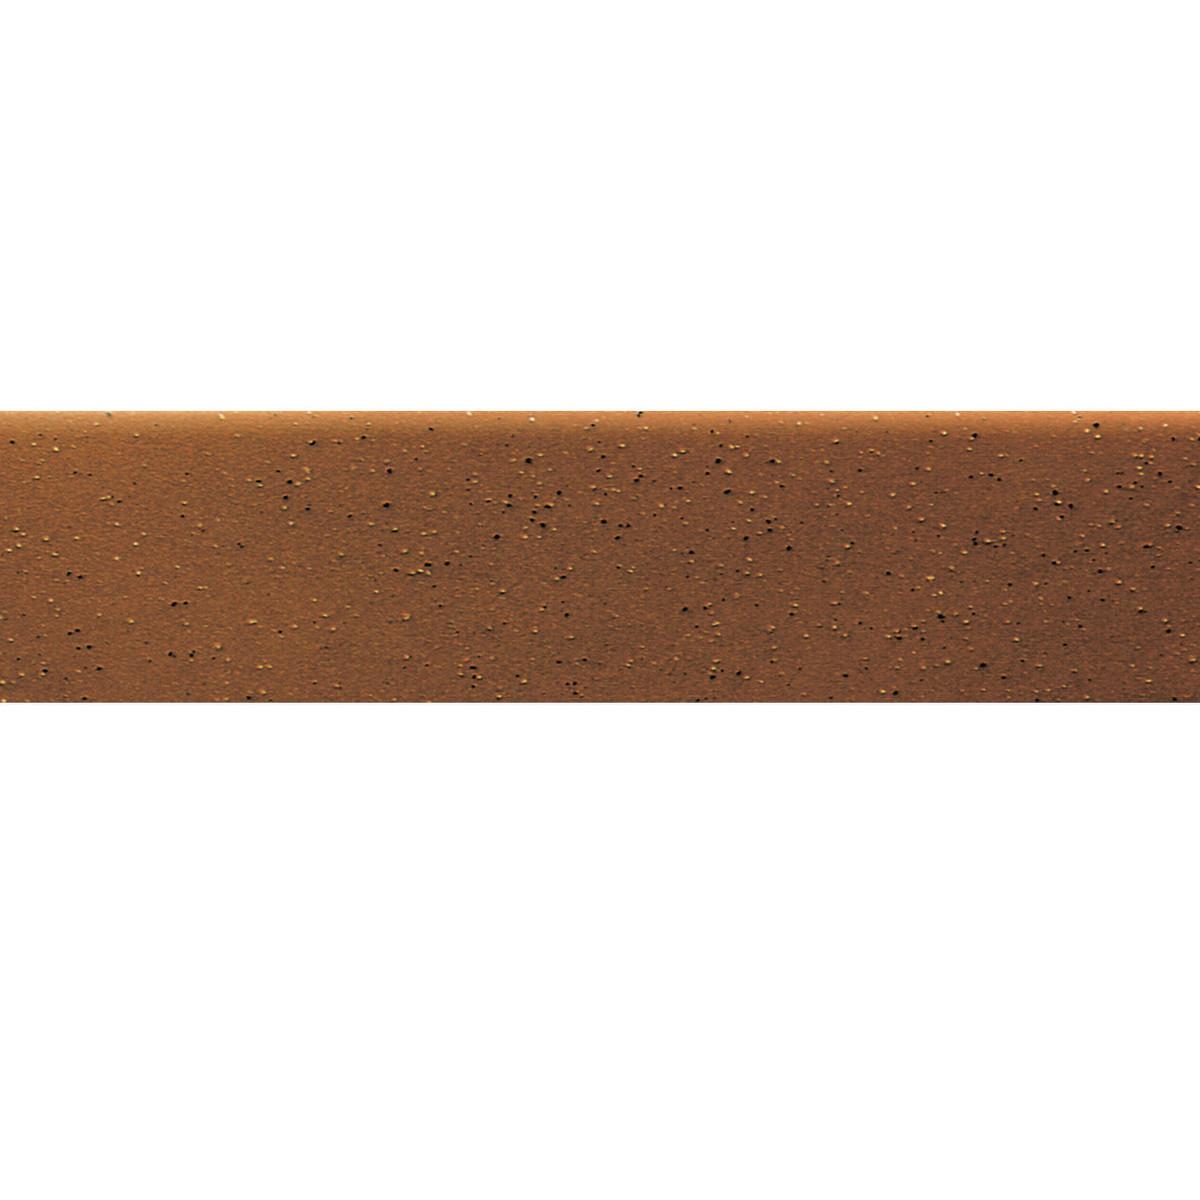 Battiscopa in ceramica: prezzi e offerte online per battiscopa in ...